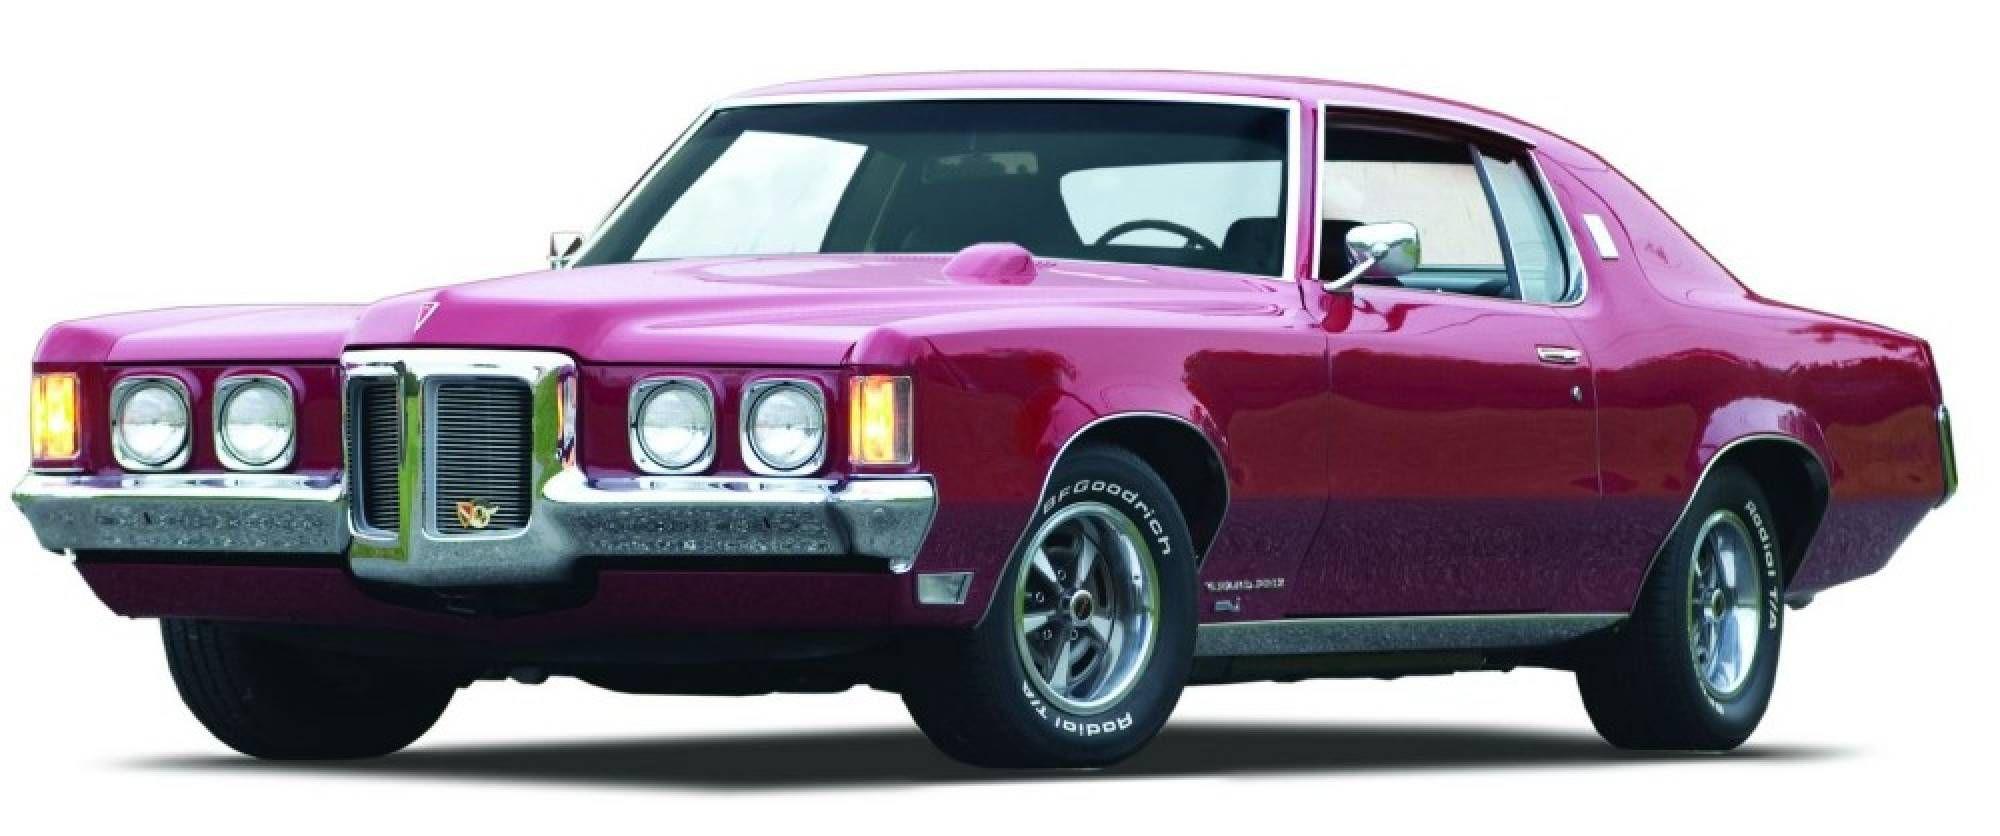 1969 pontiac grand prix model j amazing rarity a l hemmings motor news